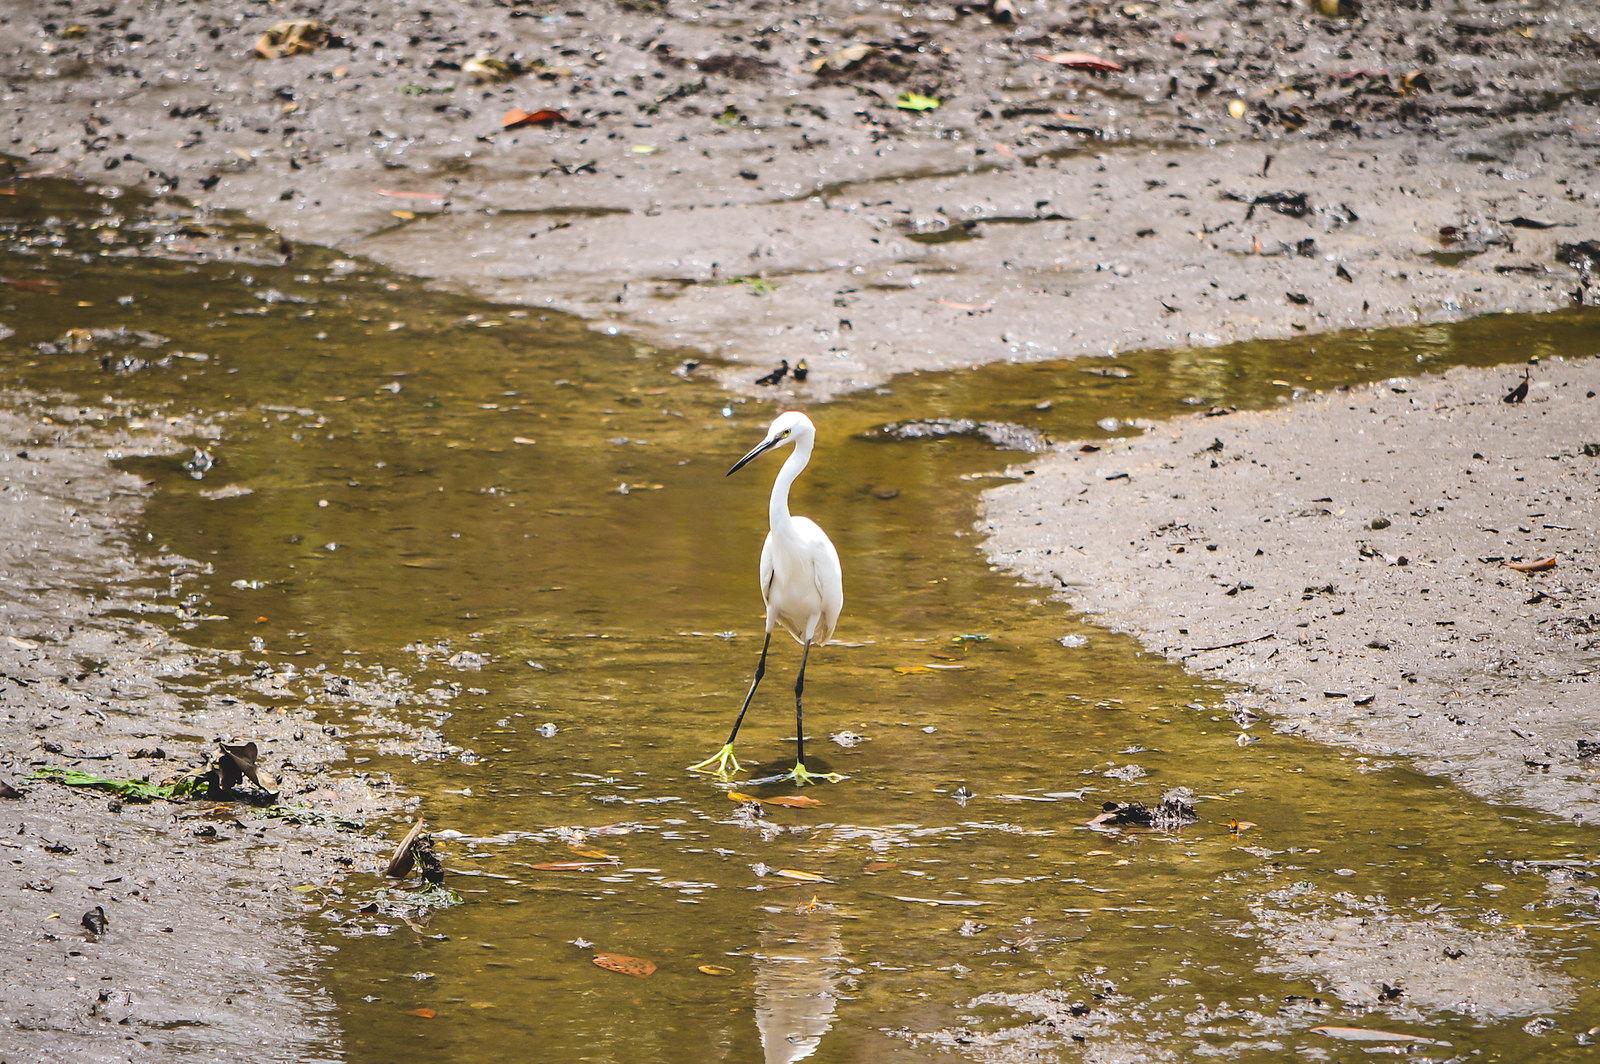 Sungei Buloh Wetland Reserve, Singapore 2018